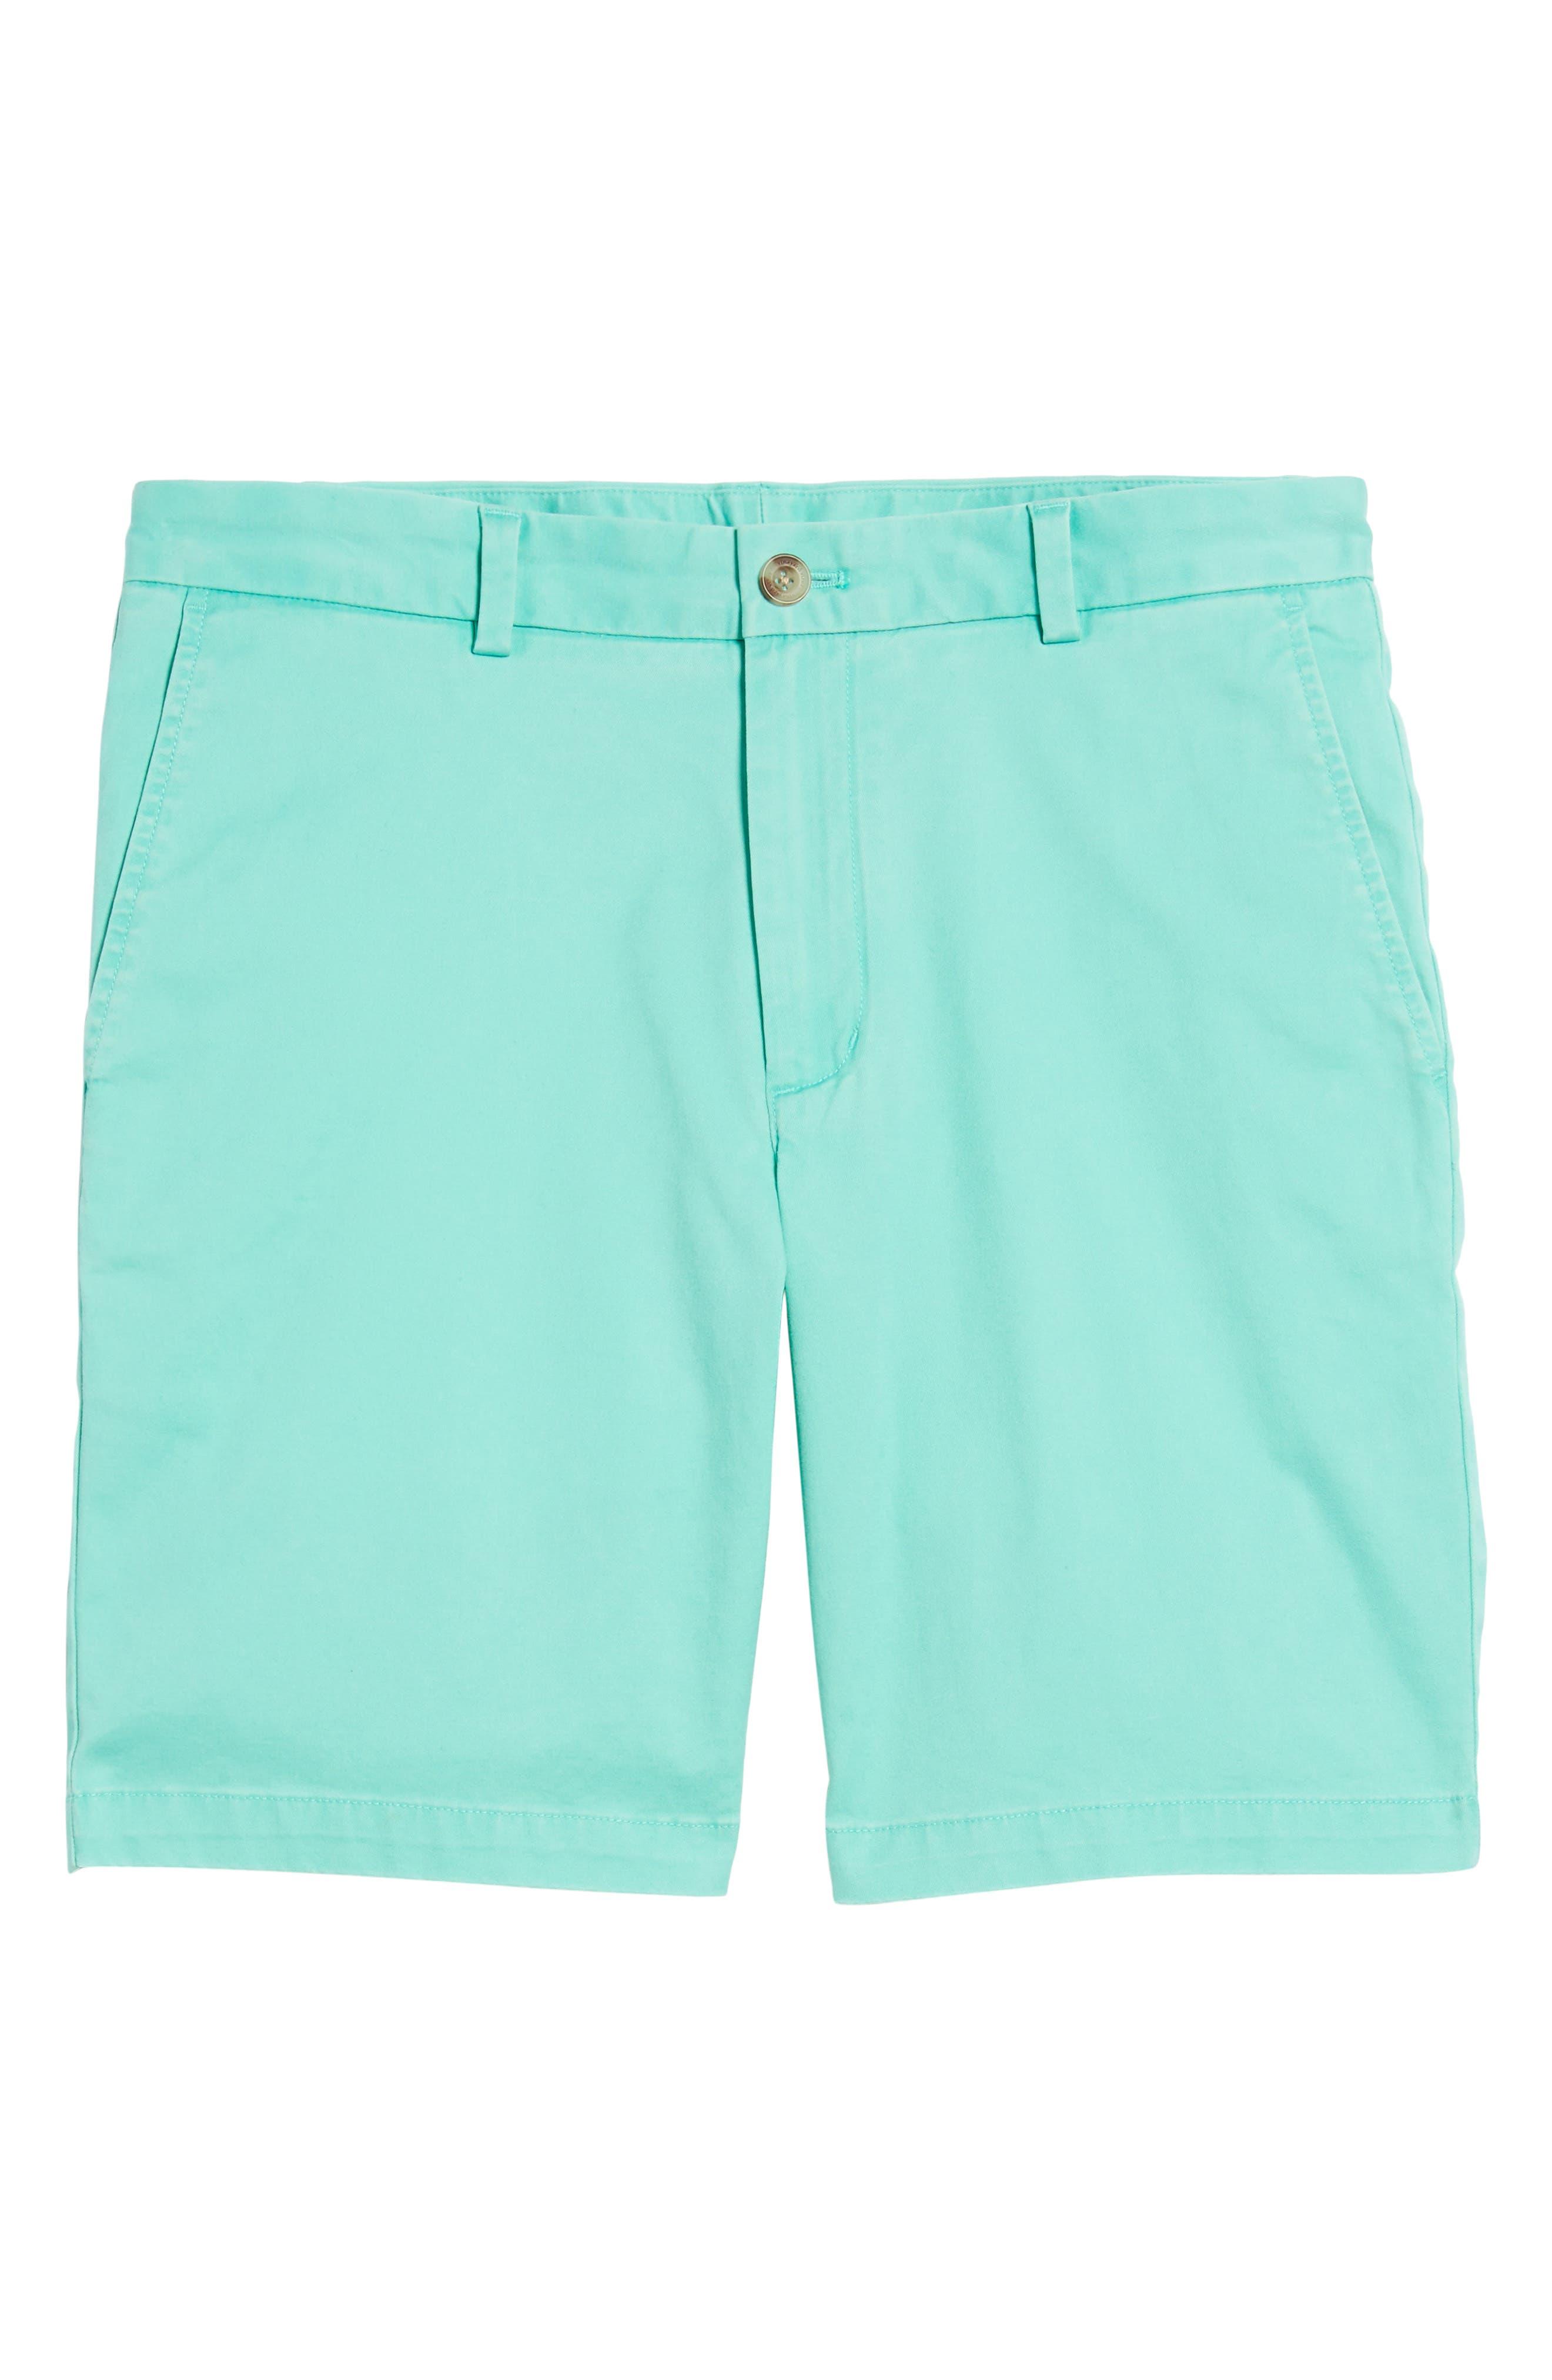 9 Inch Stretch Breaker Shorts,                             Alternate thumbnail 114, color,